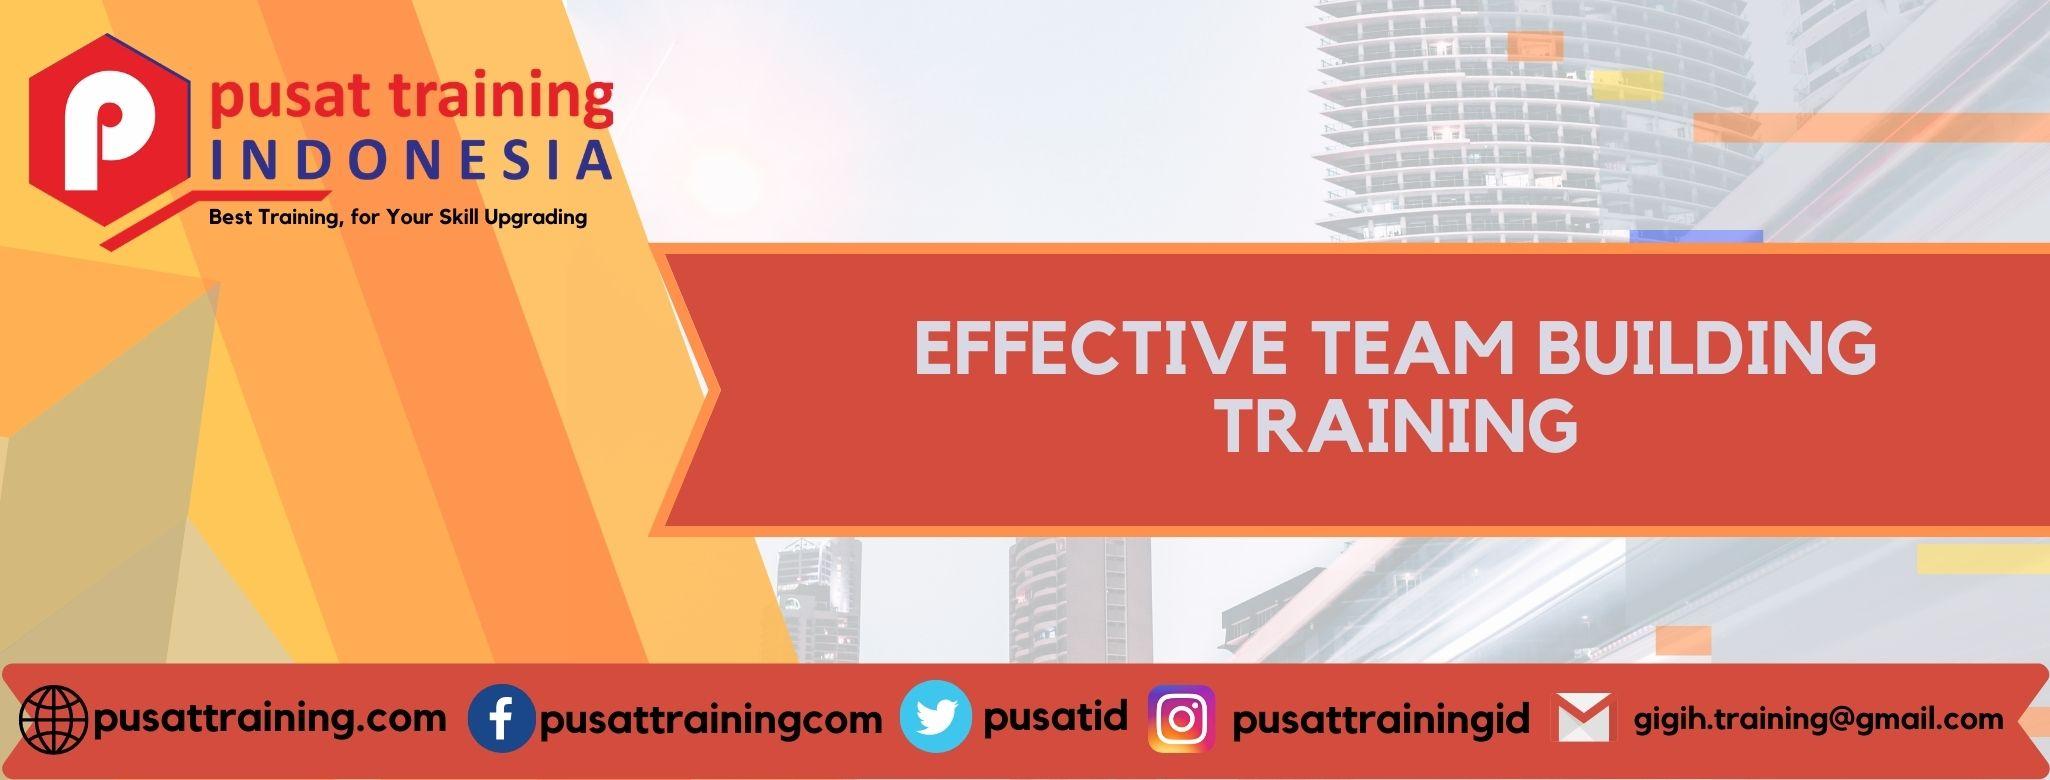 EFFECTIVE TEAM BUILDING TRAINING